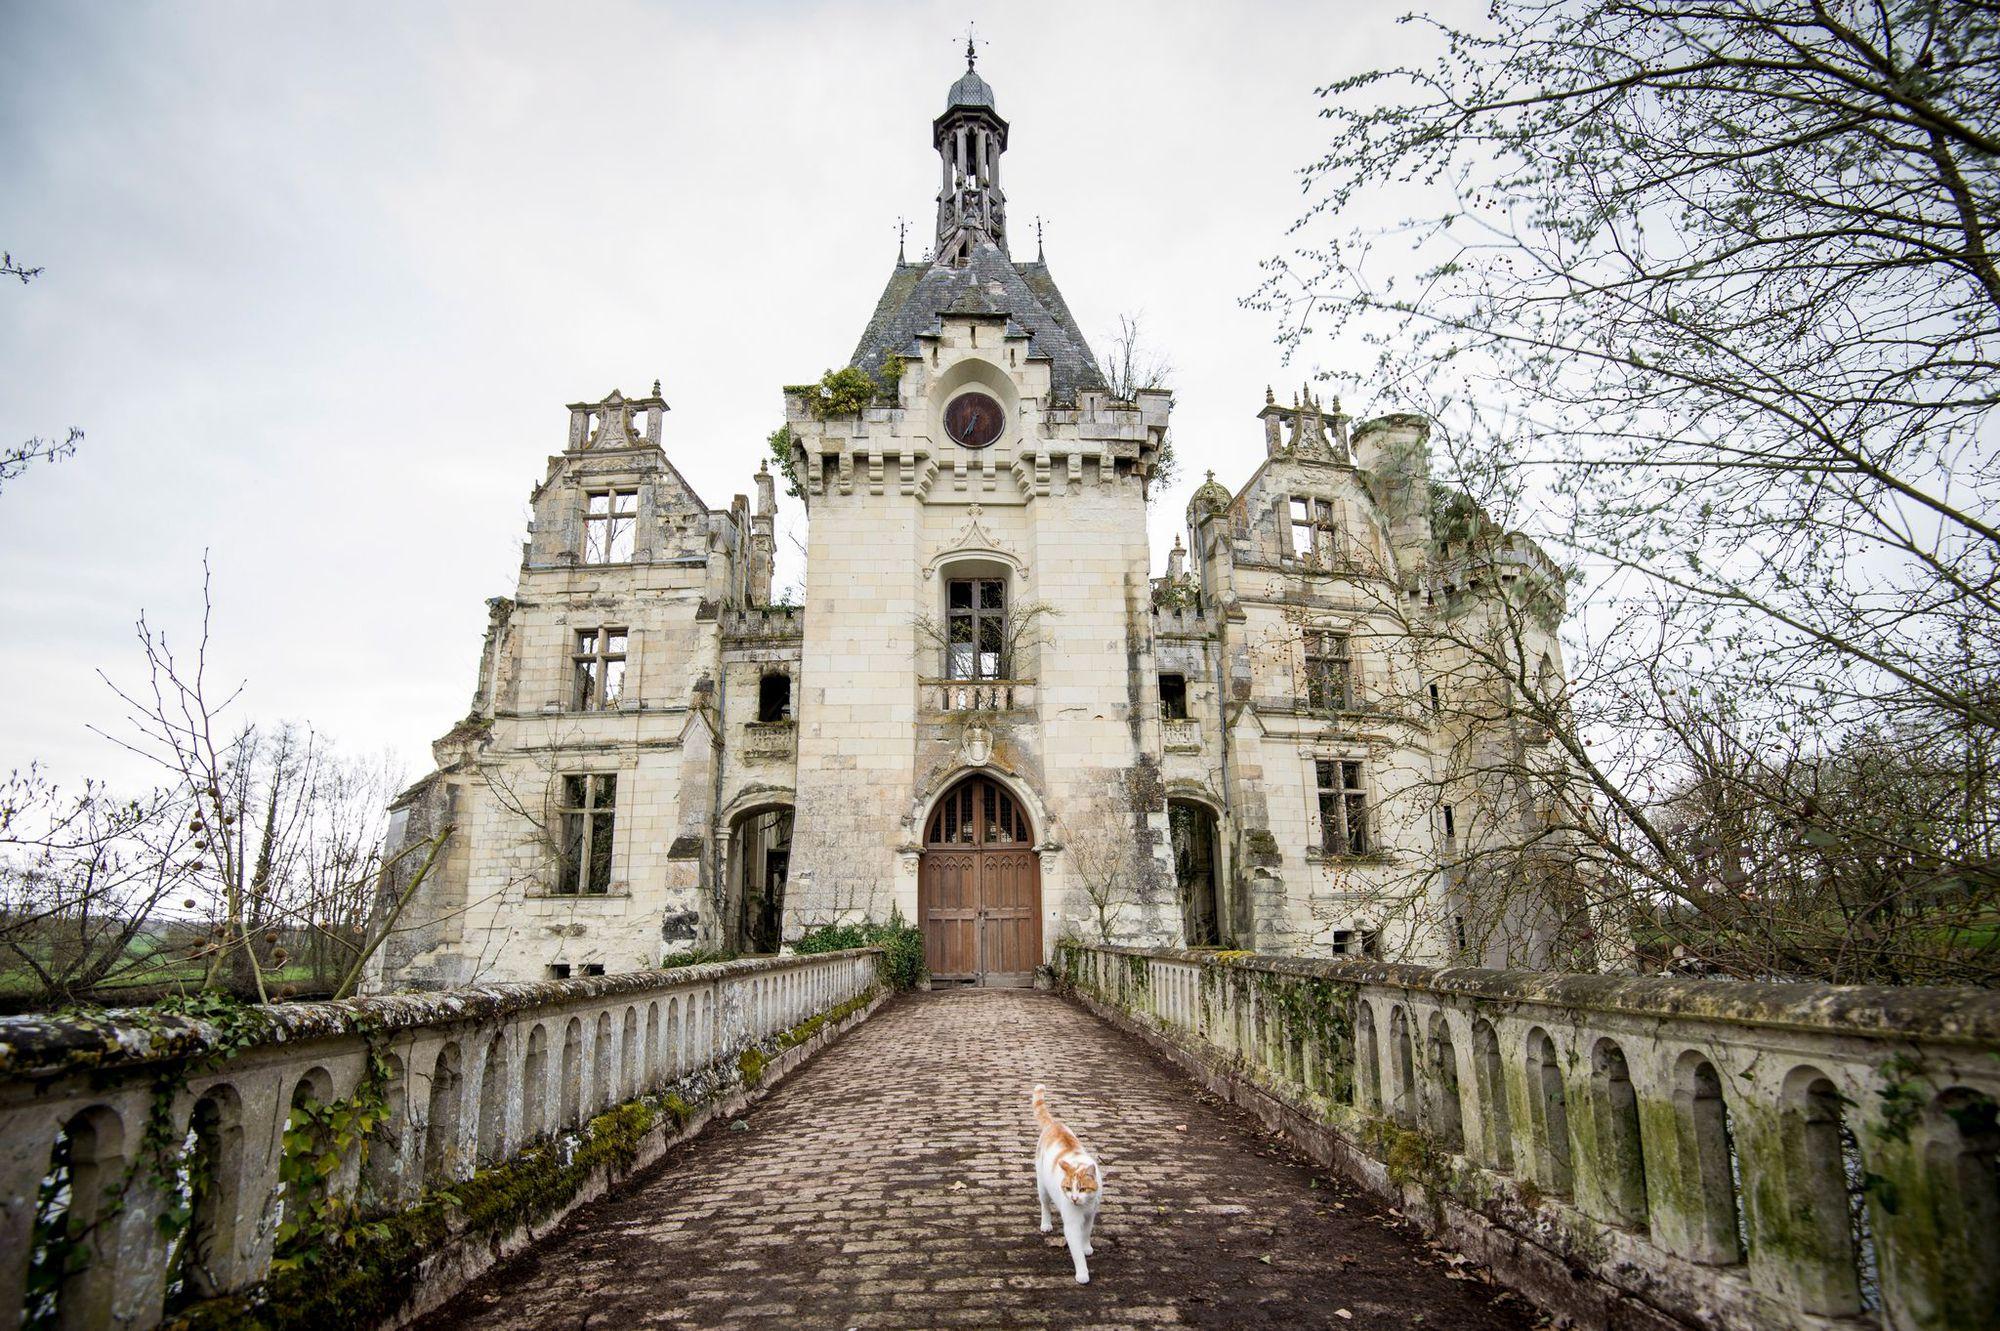 chateaudelamothe_6041930.jpg